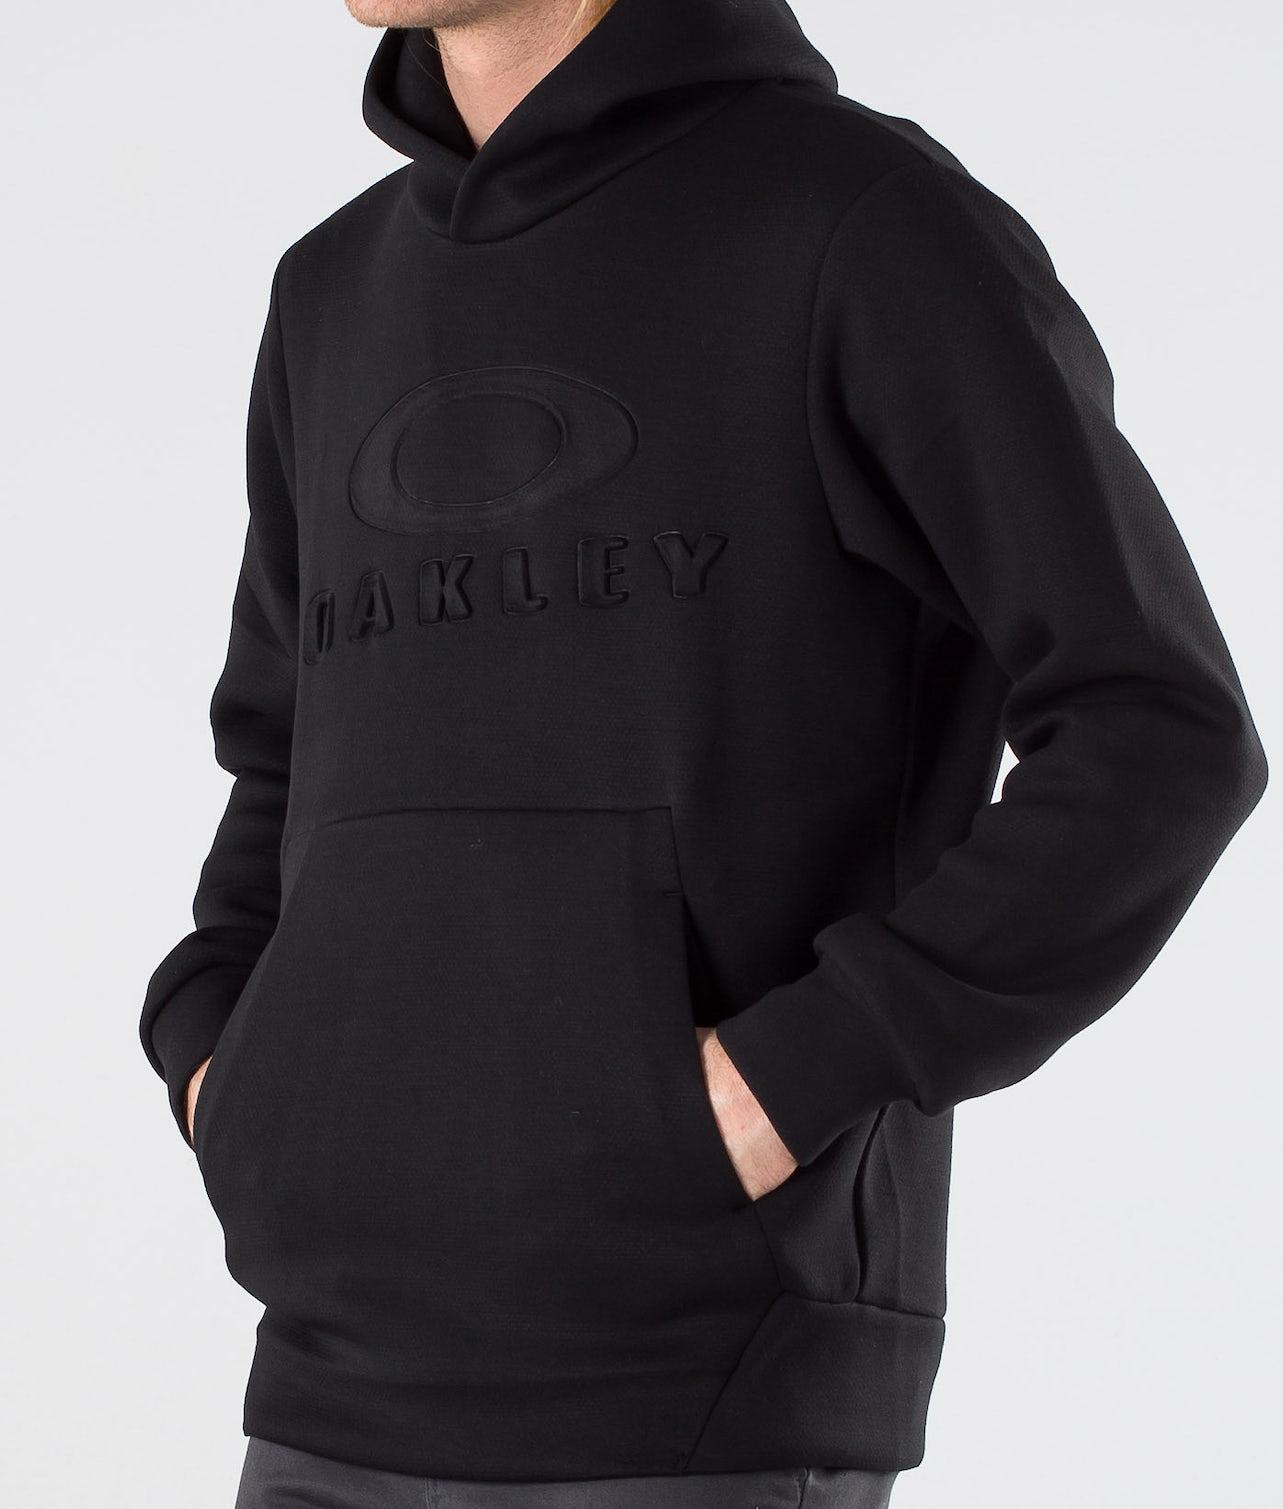 Kaufe Enhance Qd Fleece 9.7 Hoodie von Oakley bei Ridestore.de - Kostenloser, schneller Versand & Rückversand.